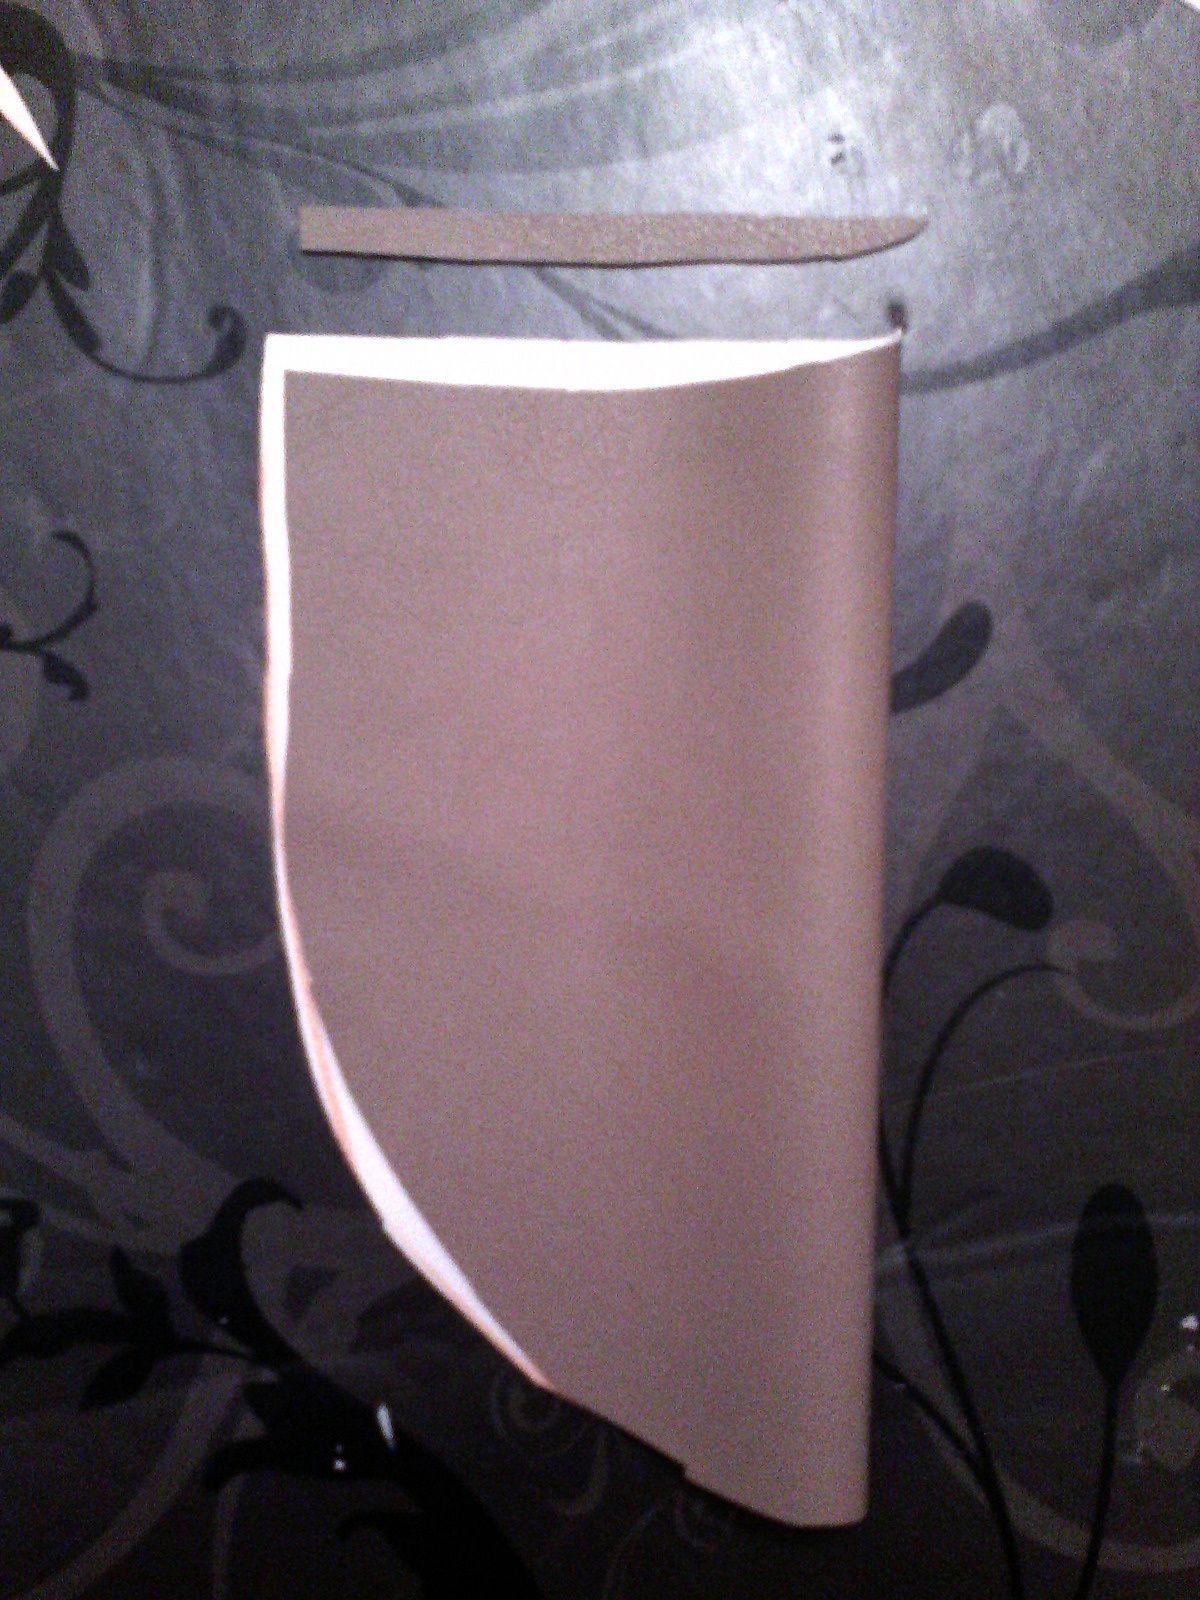 Tuto gratuit : customiser des escarpins